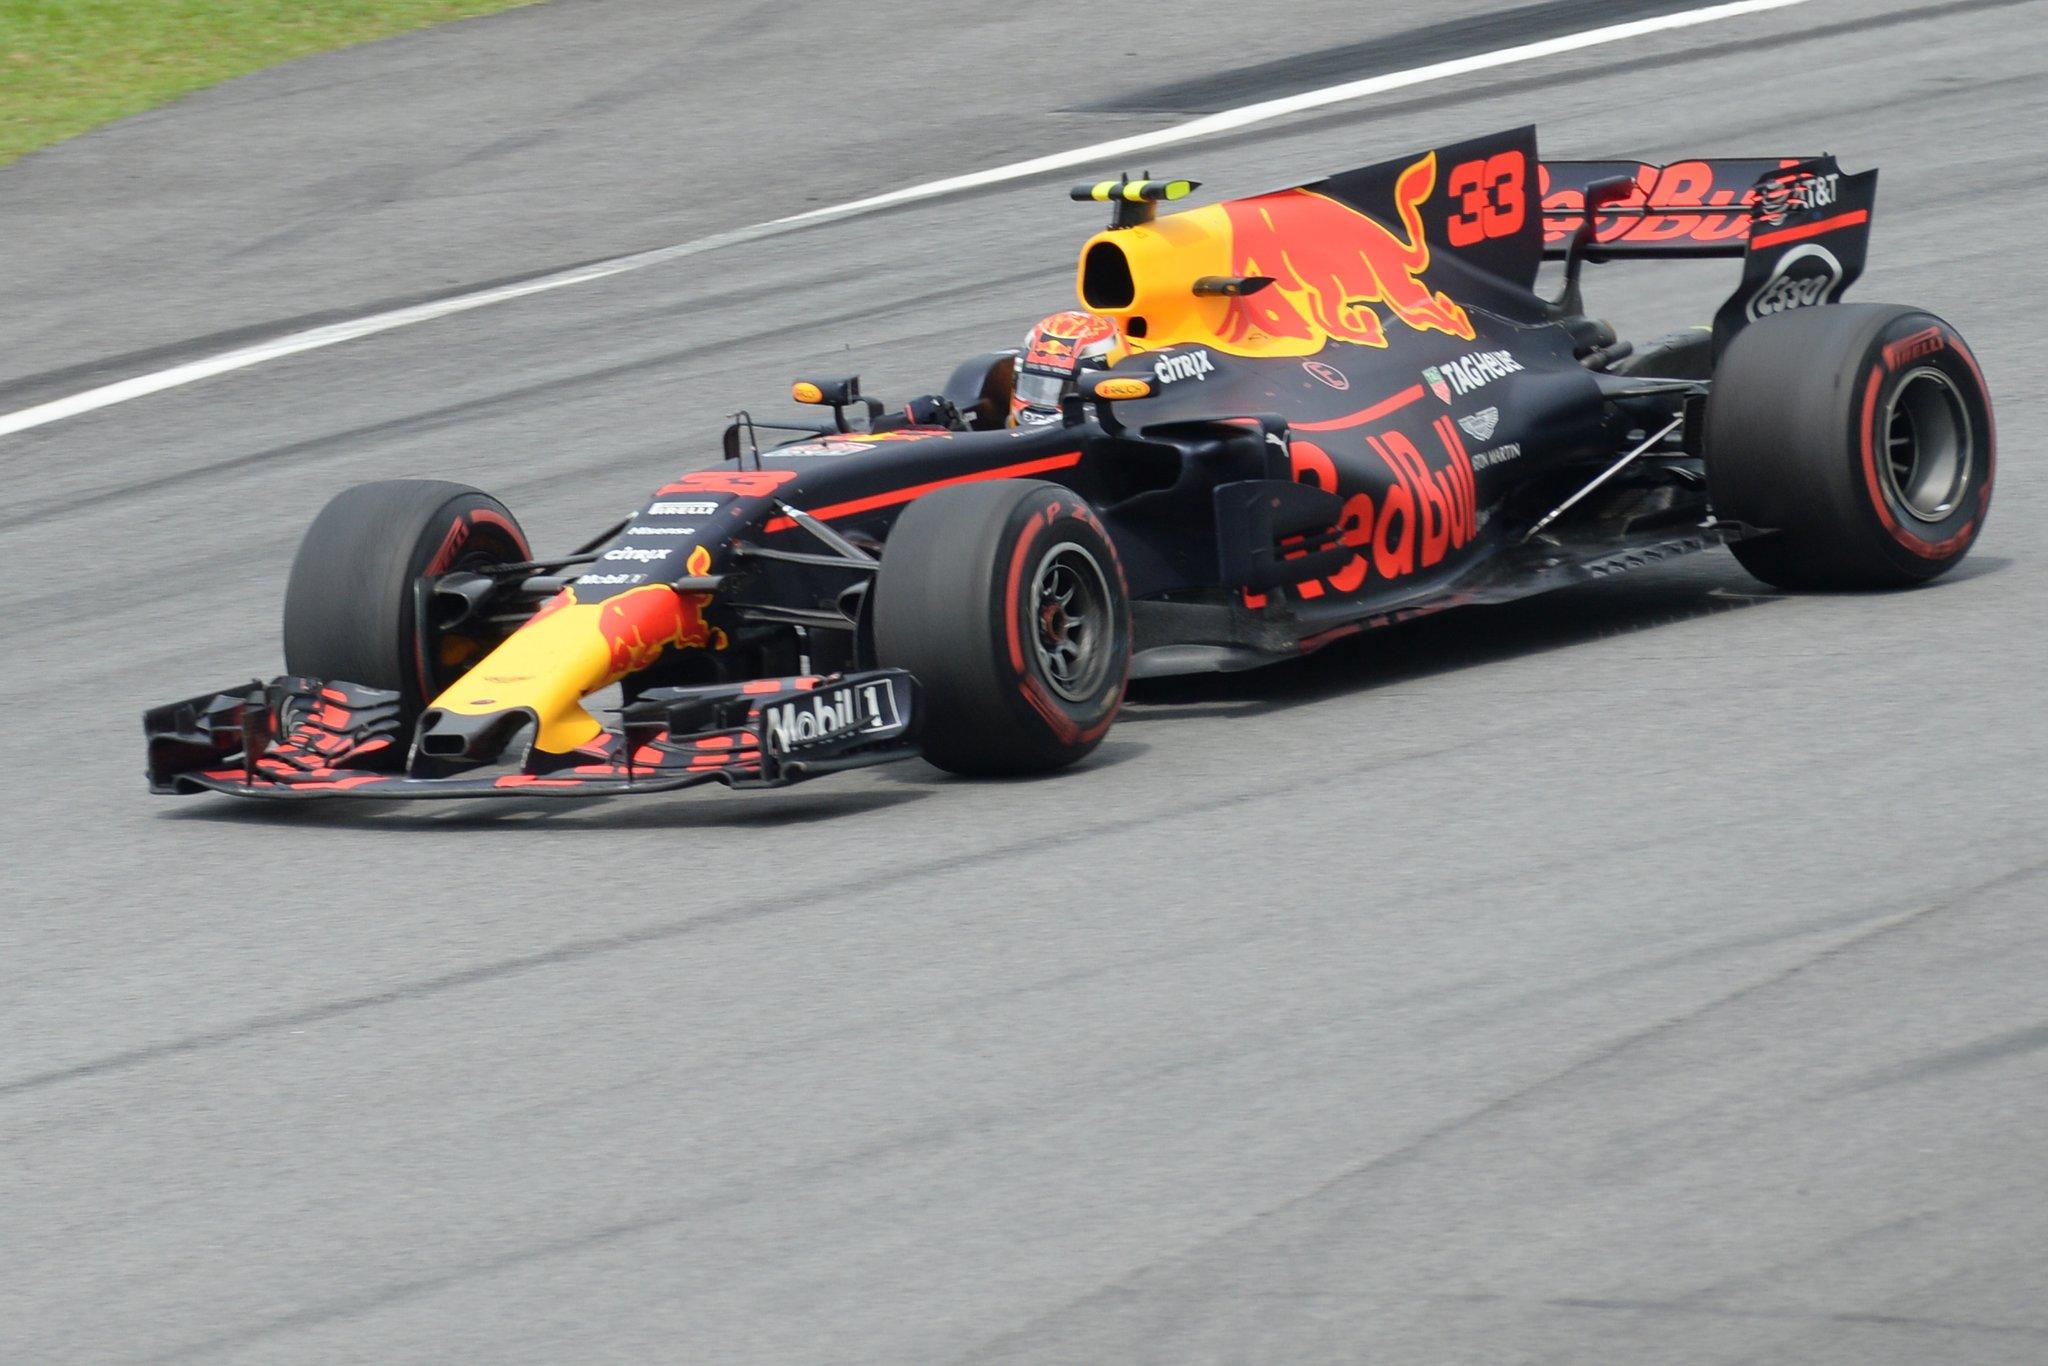 Пилот «Ред Булл» Ферстаппен одержал победу Гран-при Малайзии